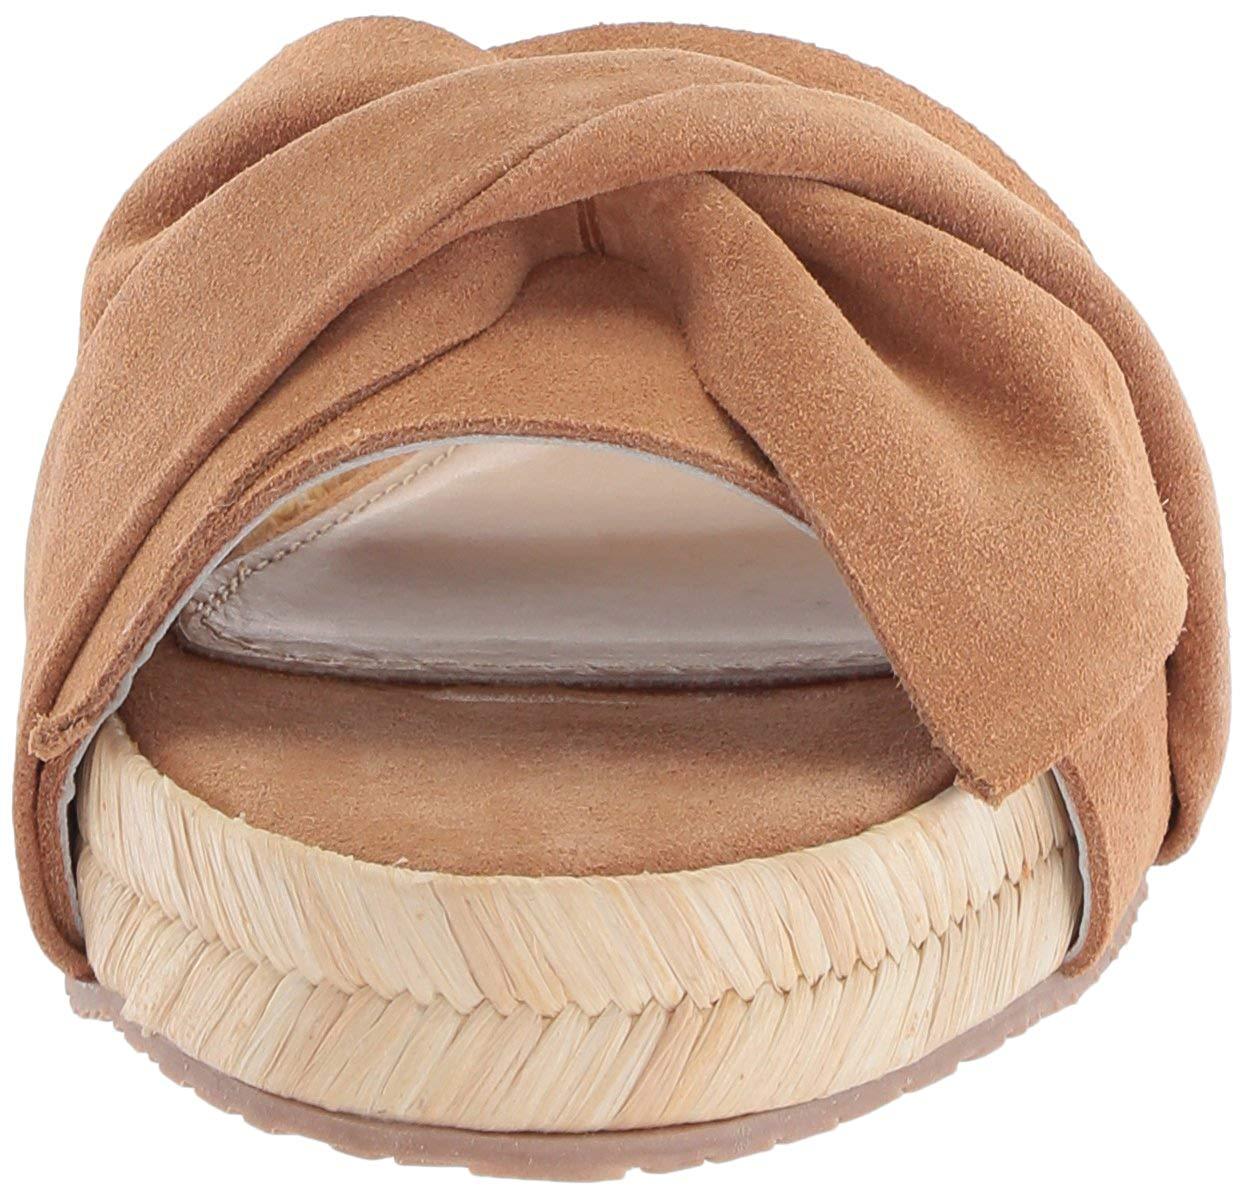 KAANAS Wouomo Sayulita Bow Bow Bow Slide Sandal | Una Grande Varietà Di Merci  314f66